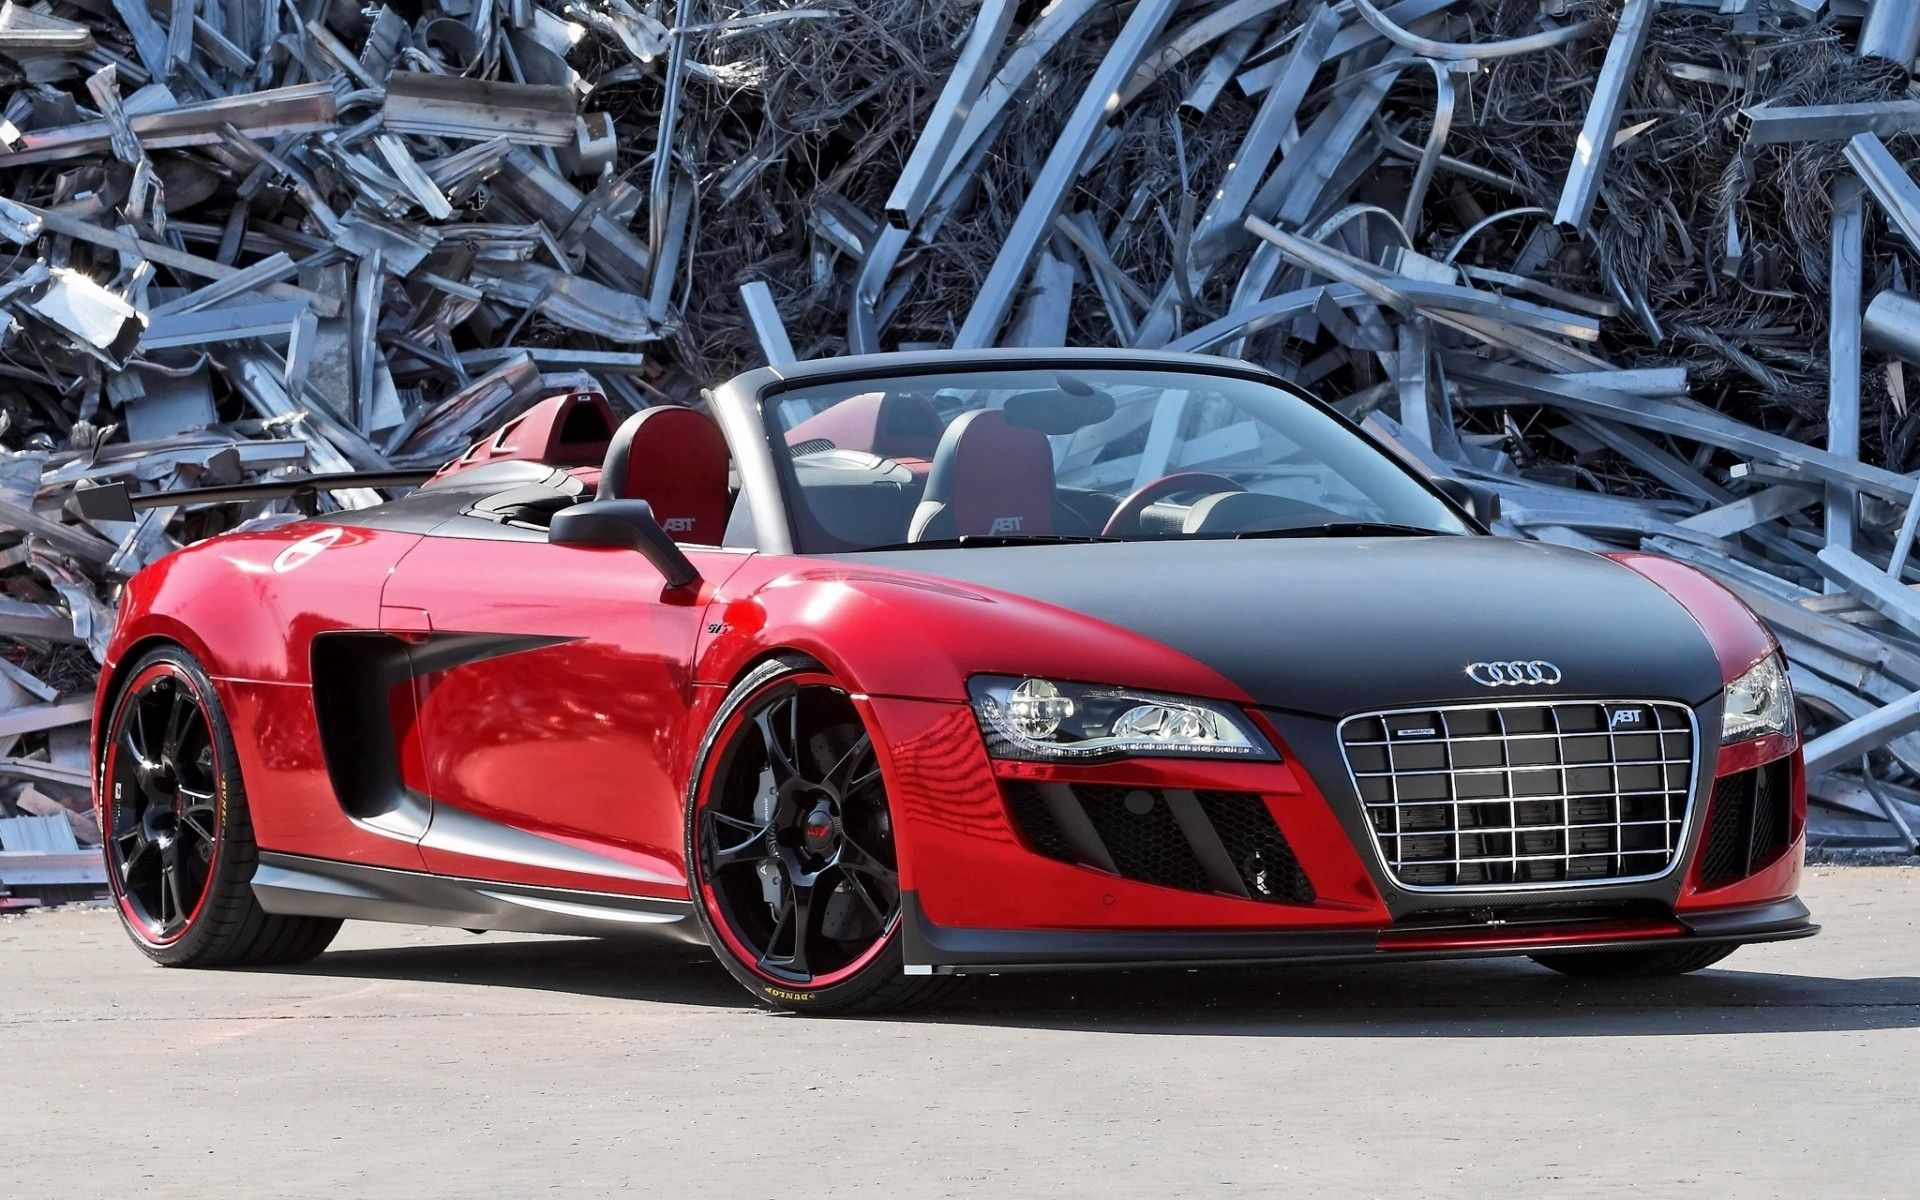 155562 descargar fondo de pantalla Coches, Audi R8, Audi, Cabriolé, Cabriolet, Vertedero, Vista Frontal: protectores de pantalla e imágenes gratis